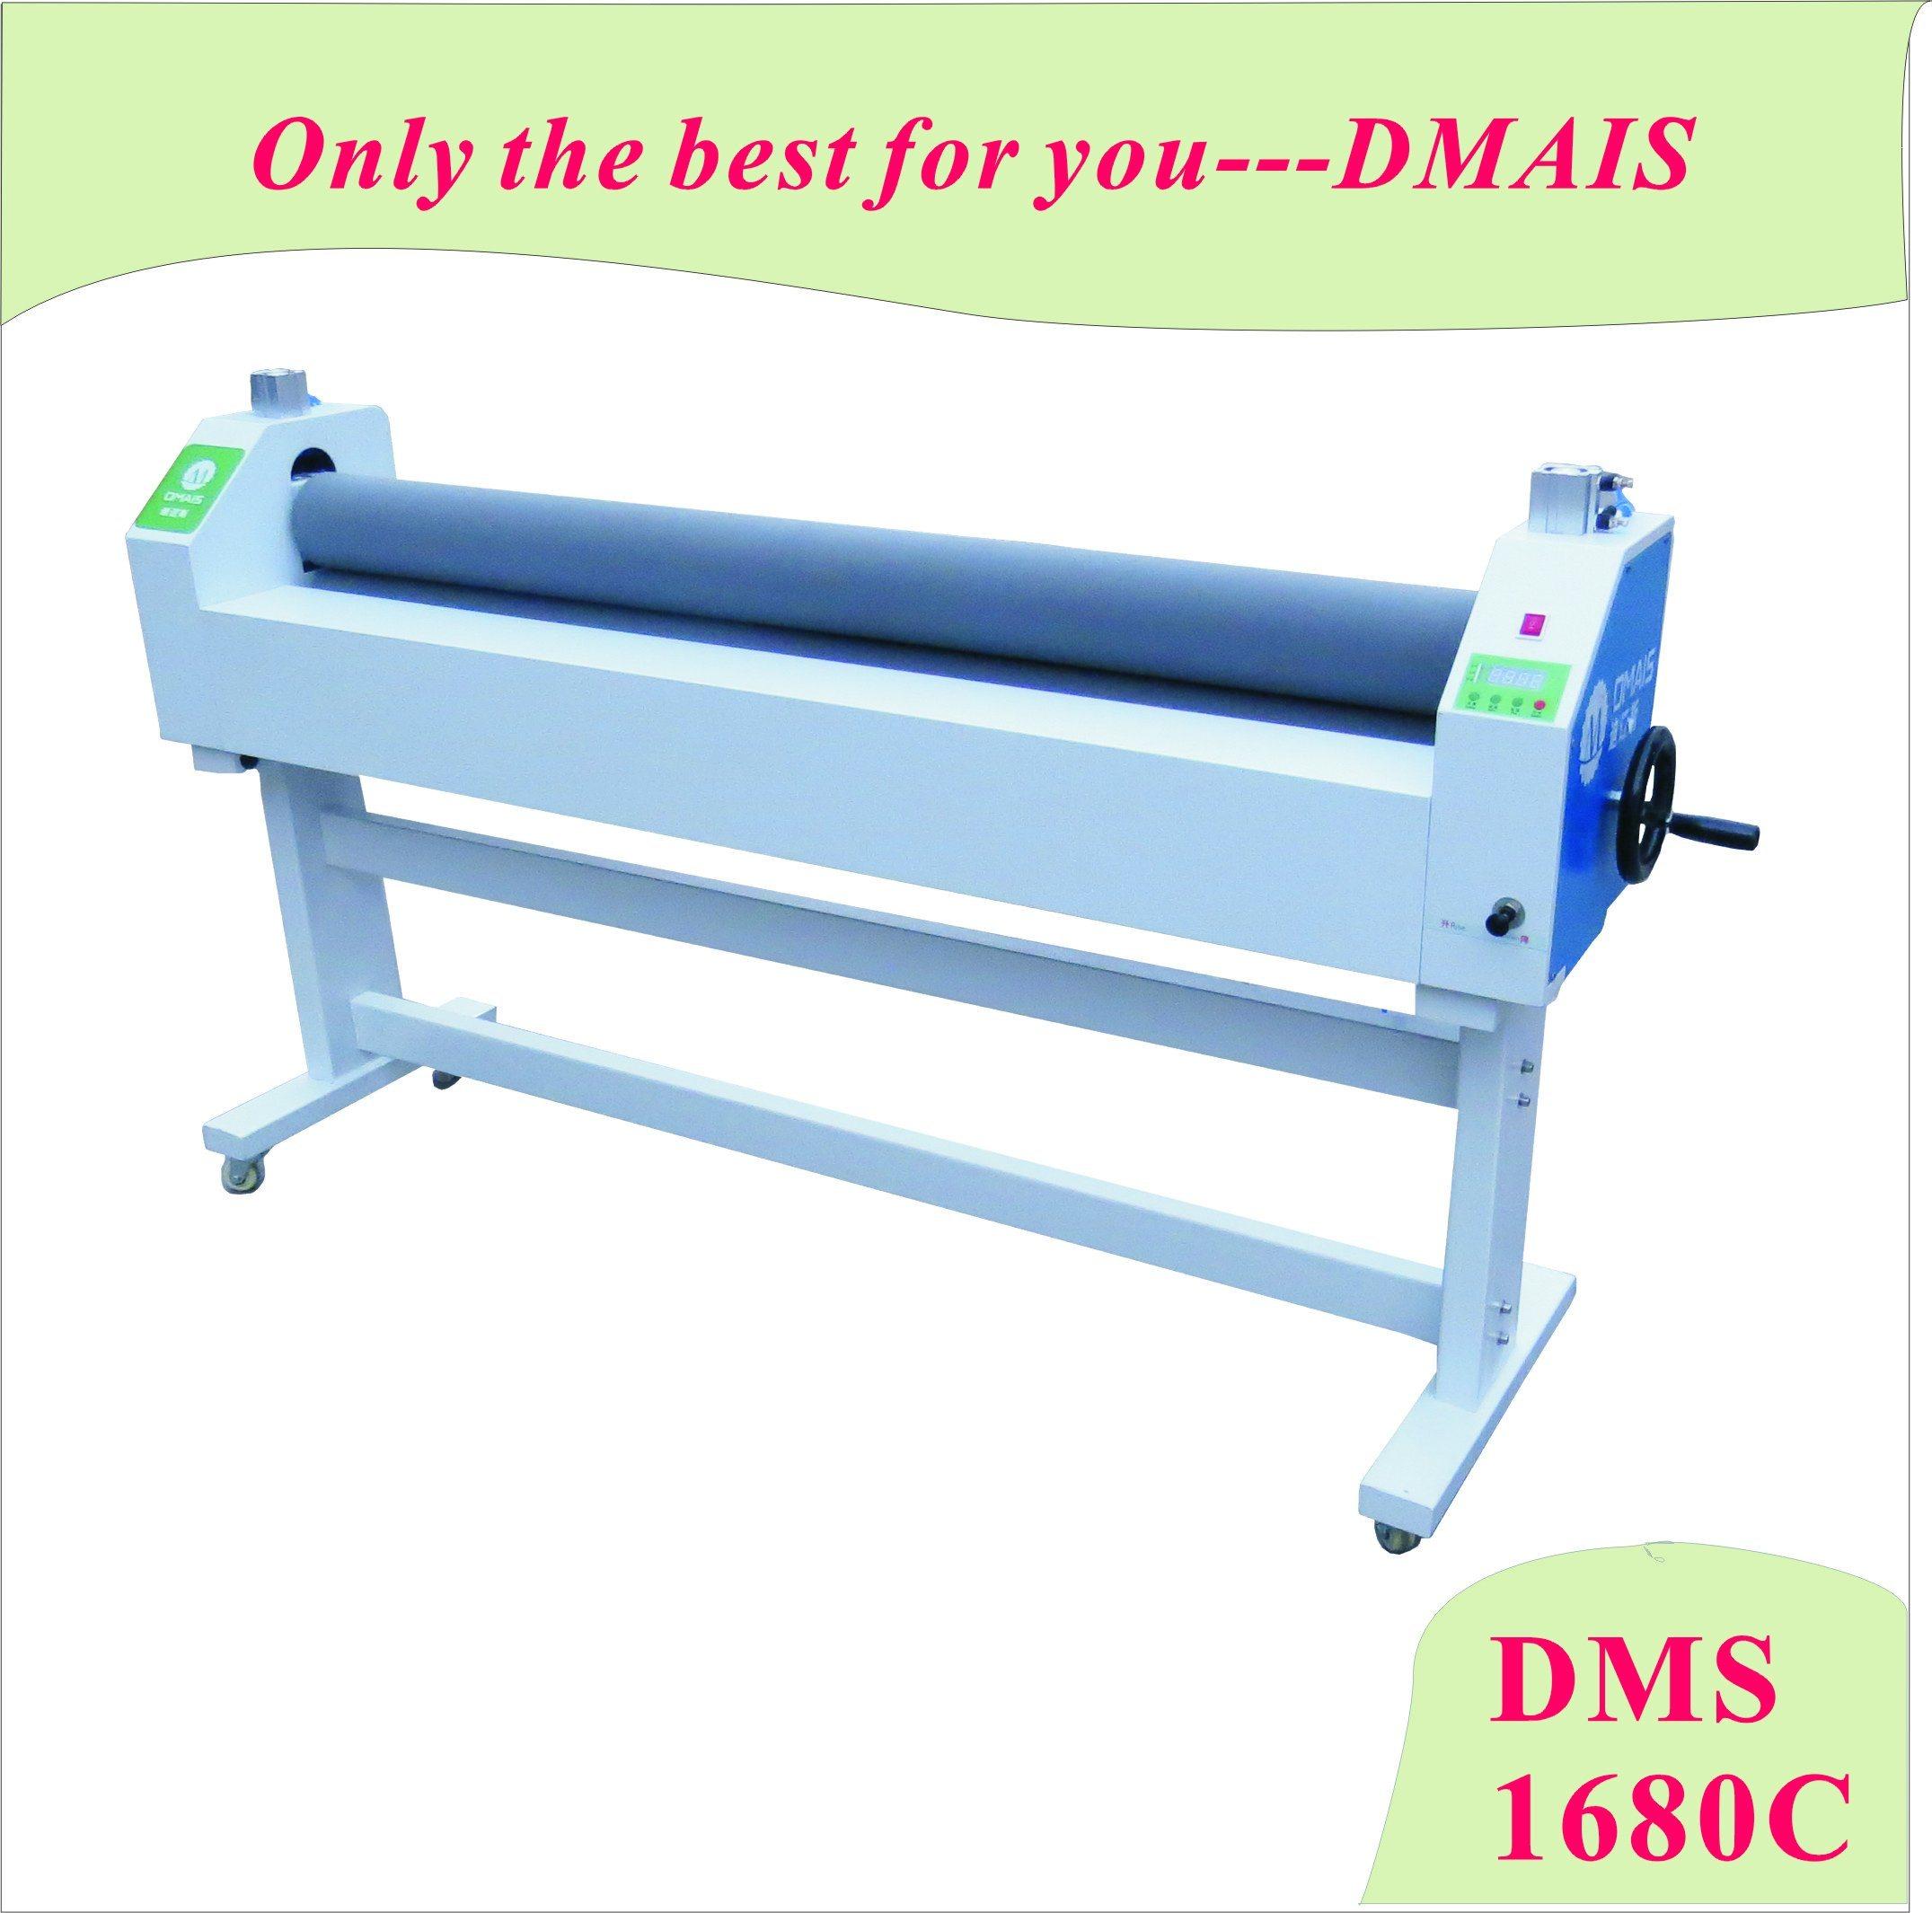 Dmais 1600 Single Side Pnematic & Manual Rolling Cold Laminator DMS-1680c